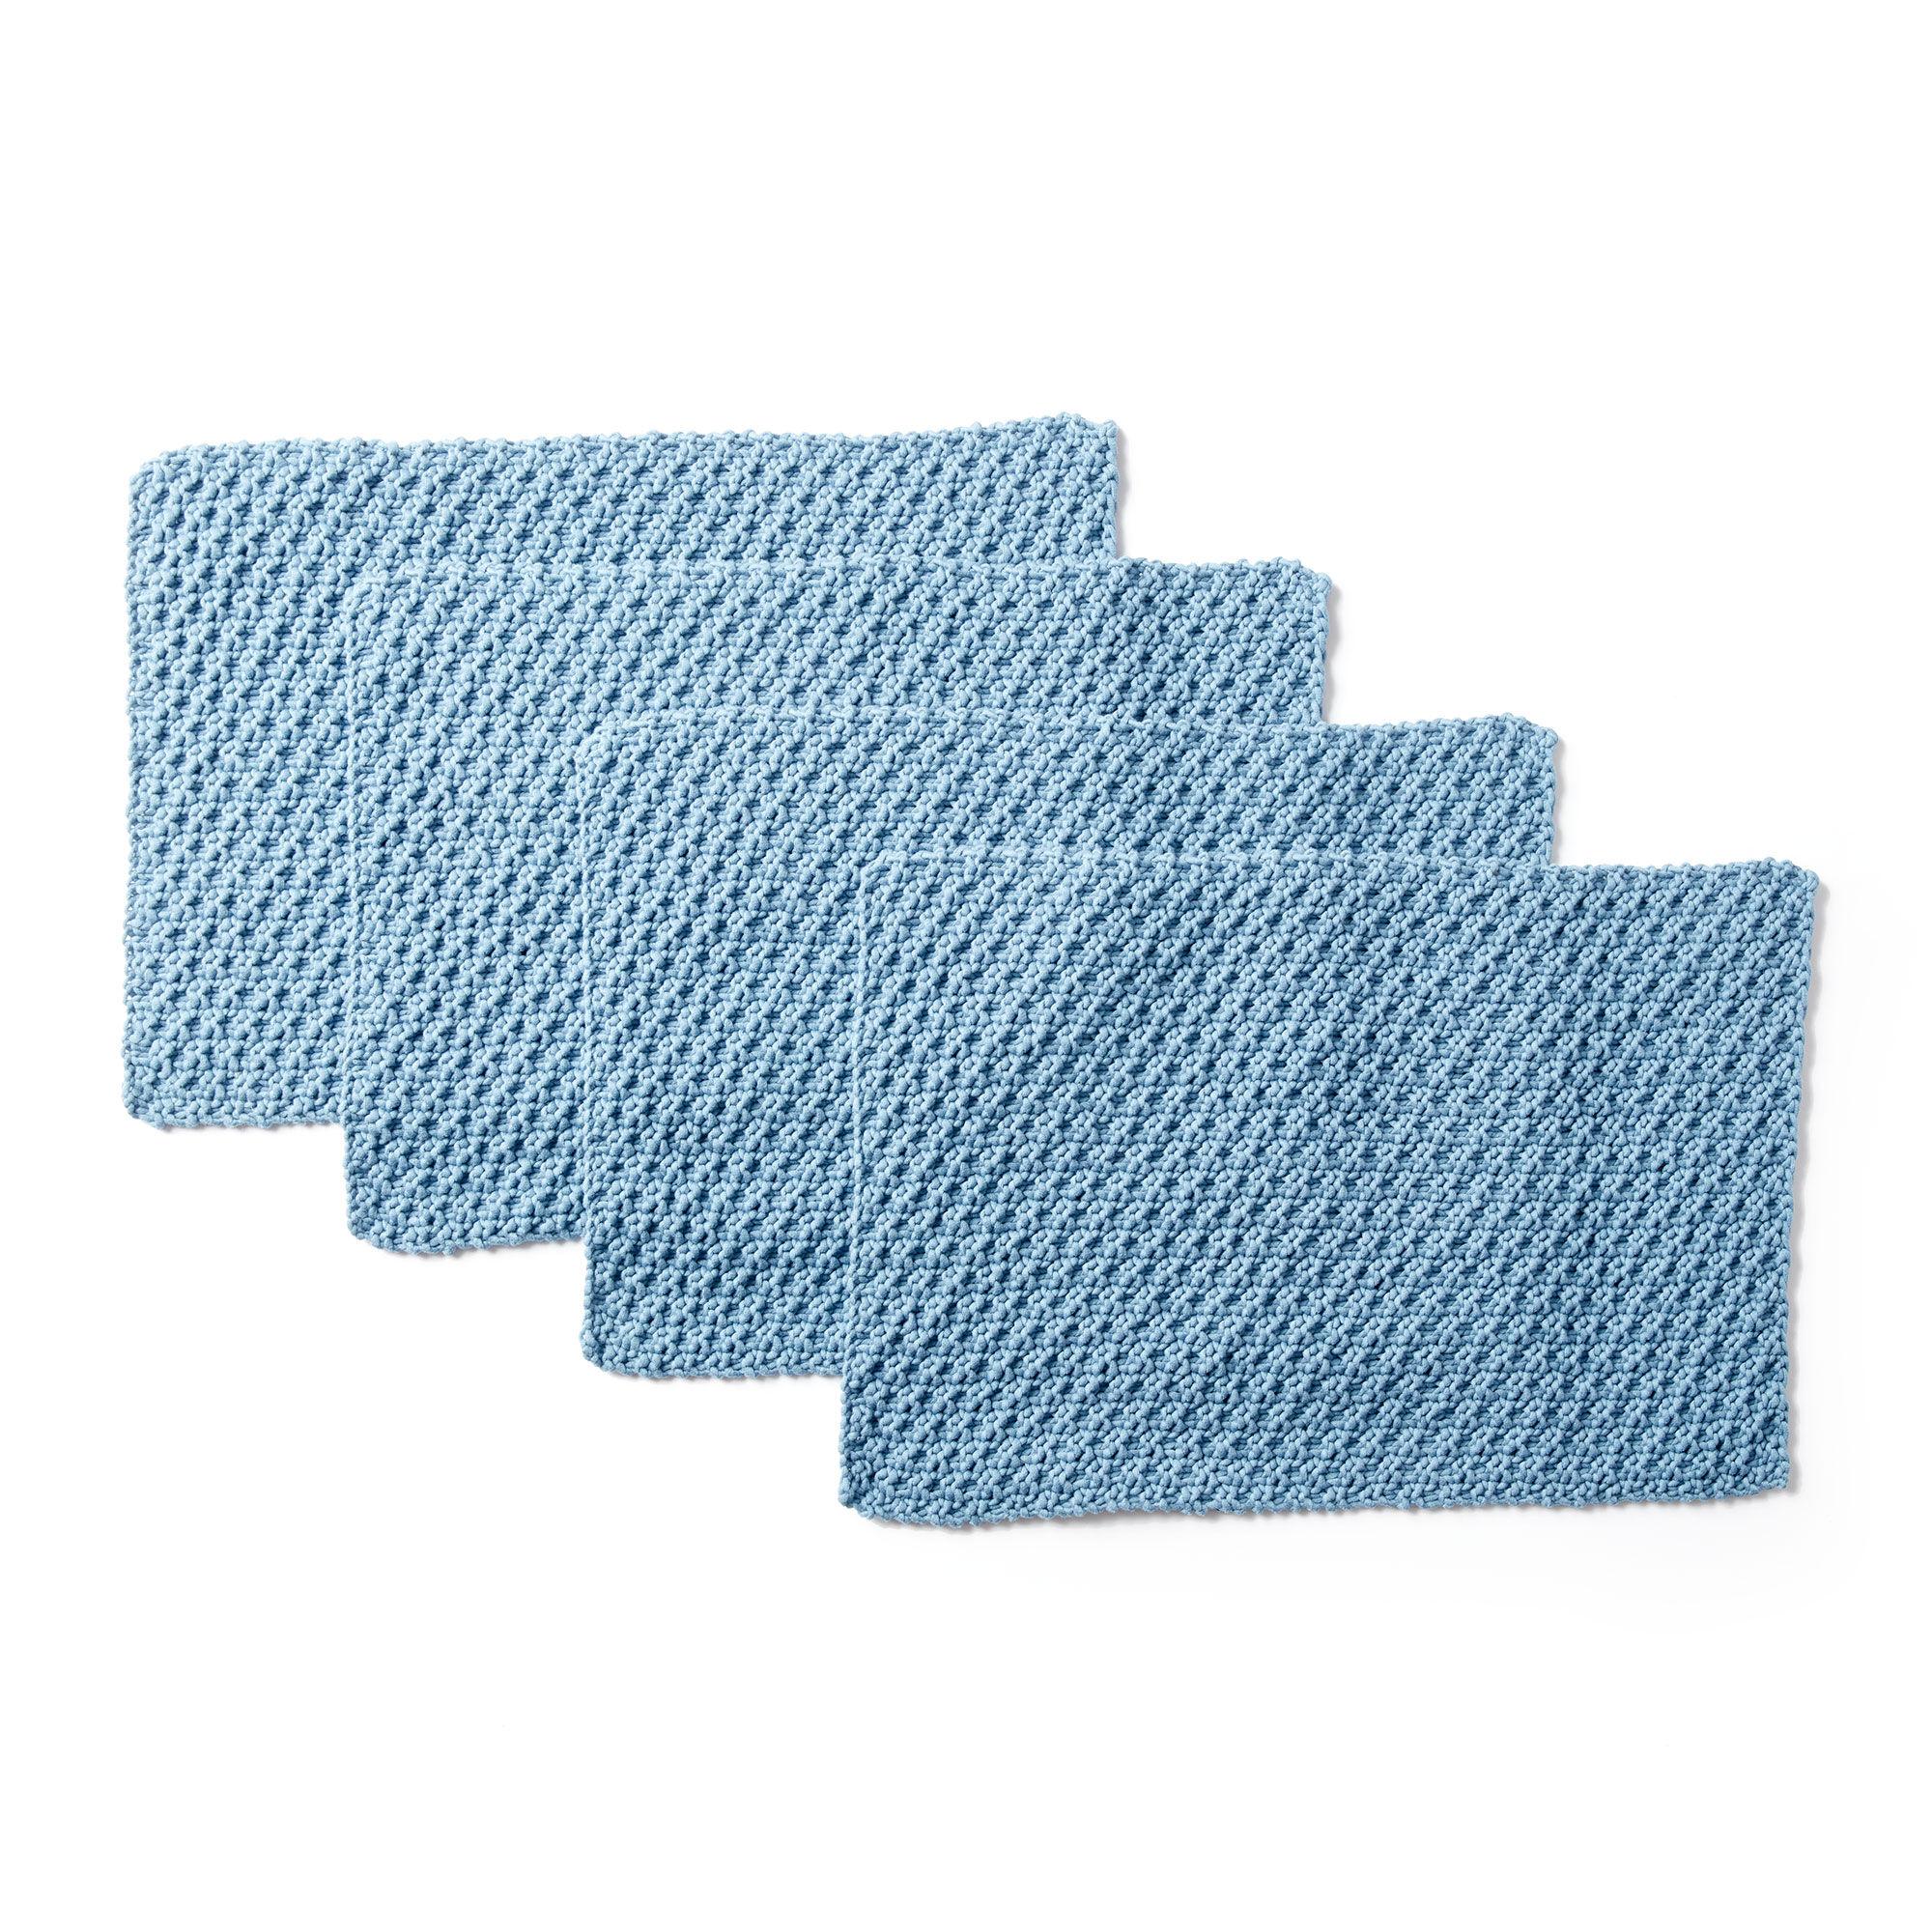 Bernat Easy Life Knit Placemats | Yarnspirations